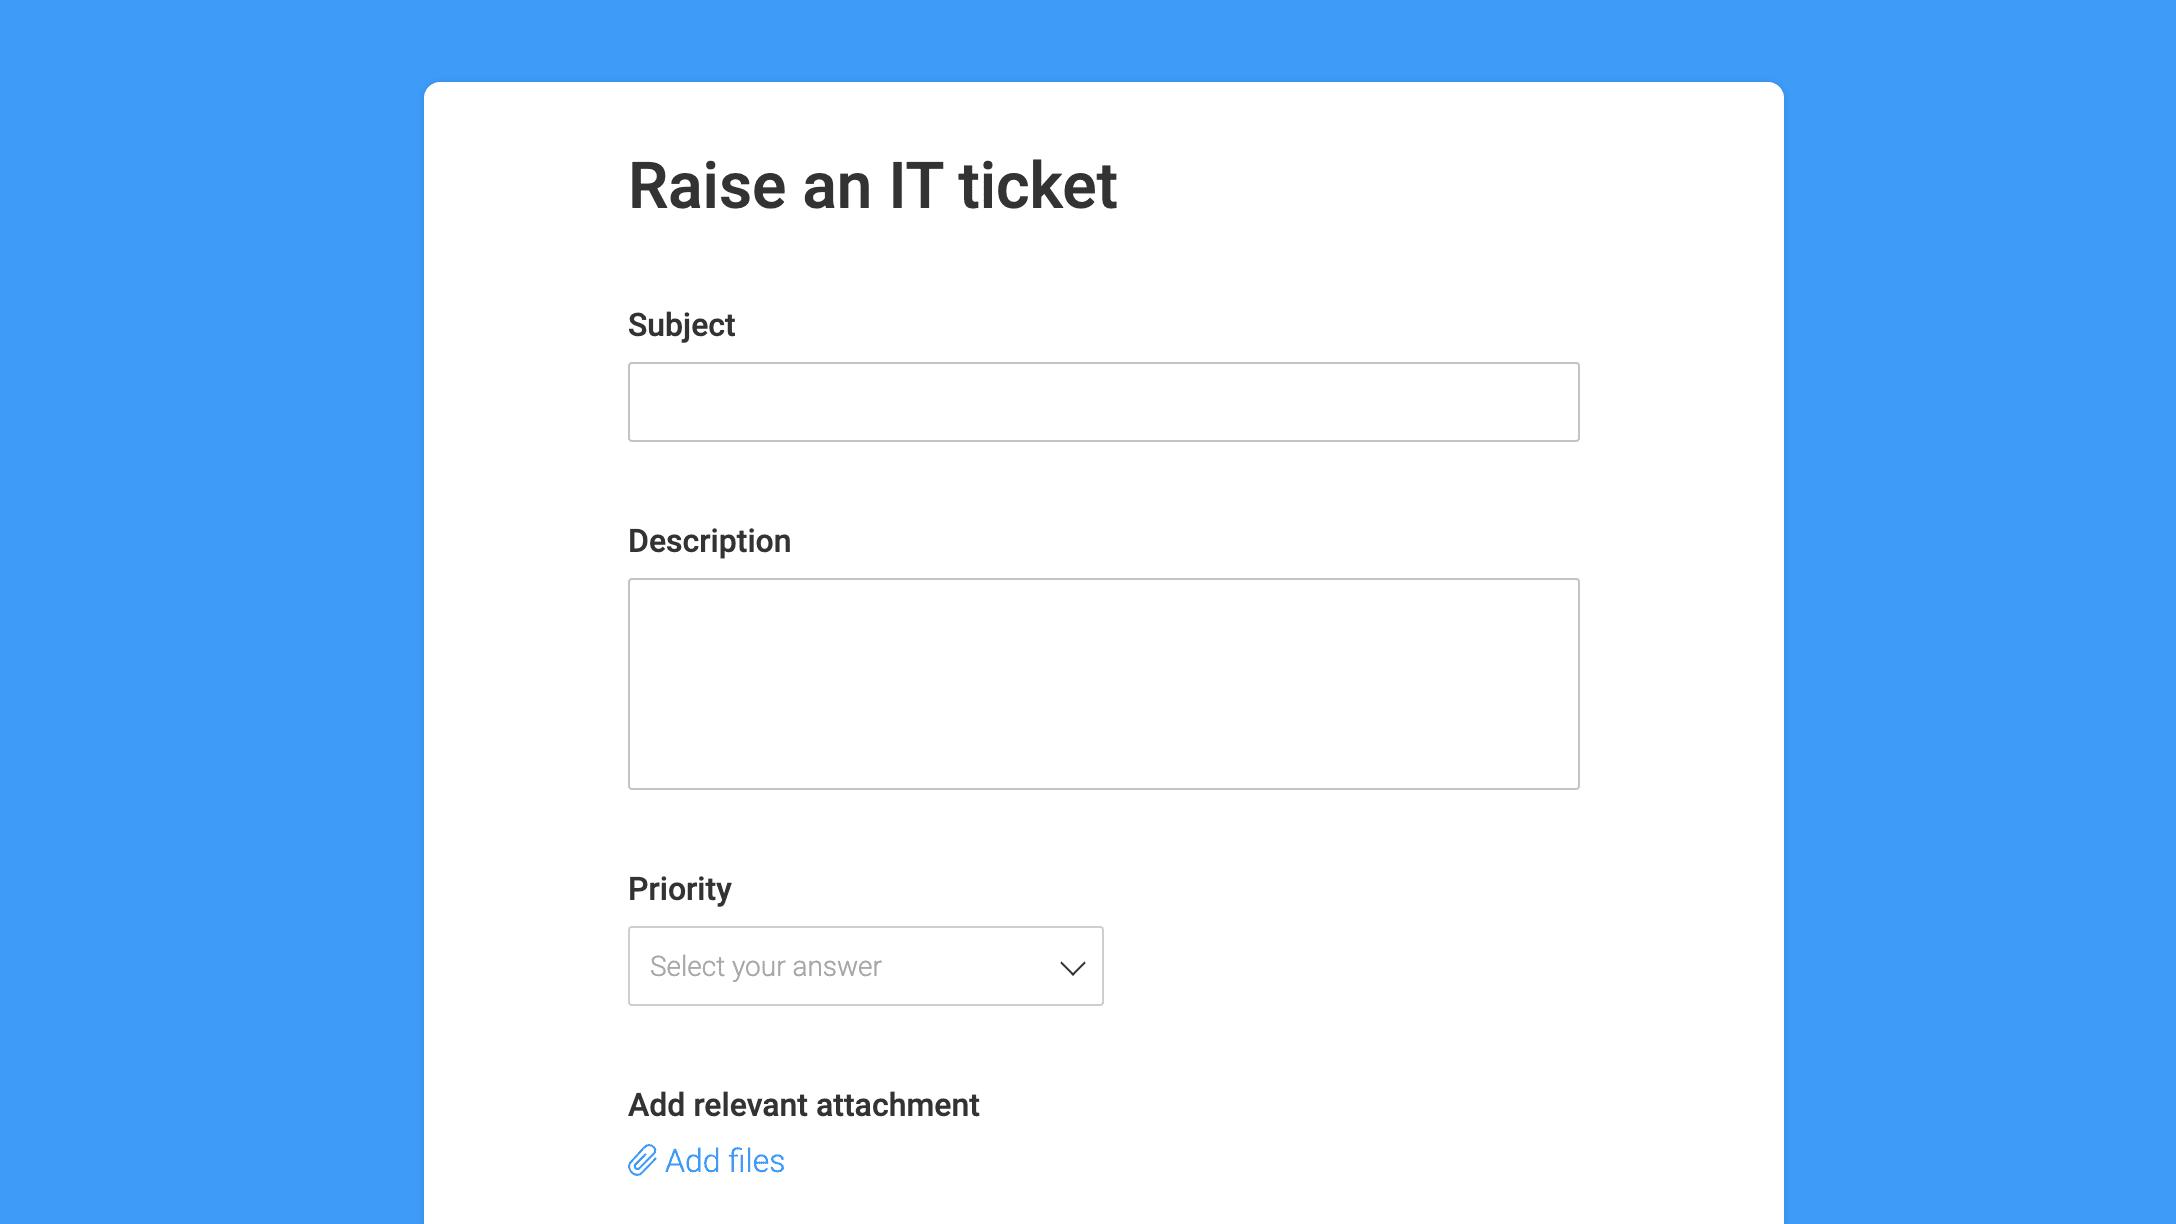 Raise an IT ticket 2020 06 10 08 38 23